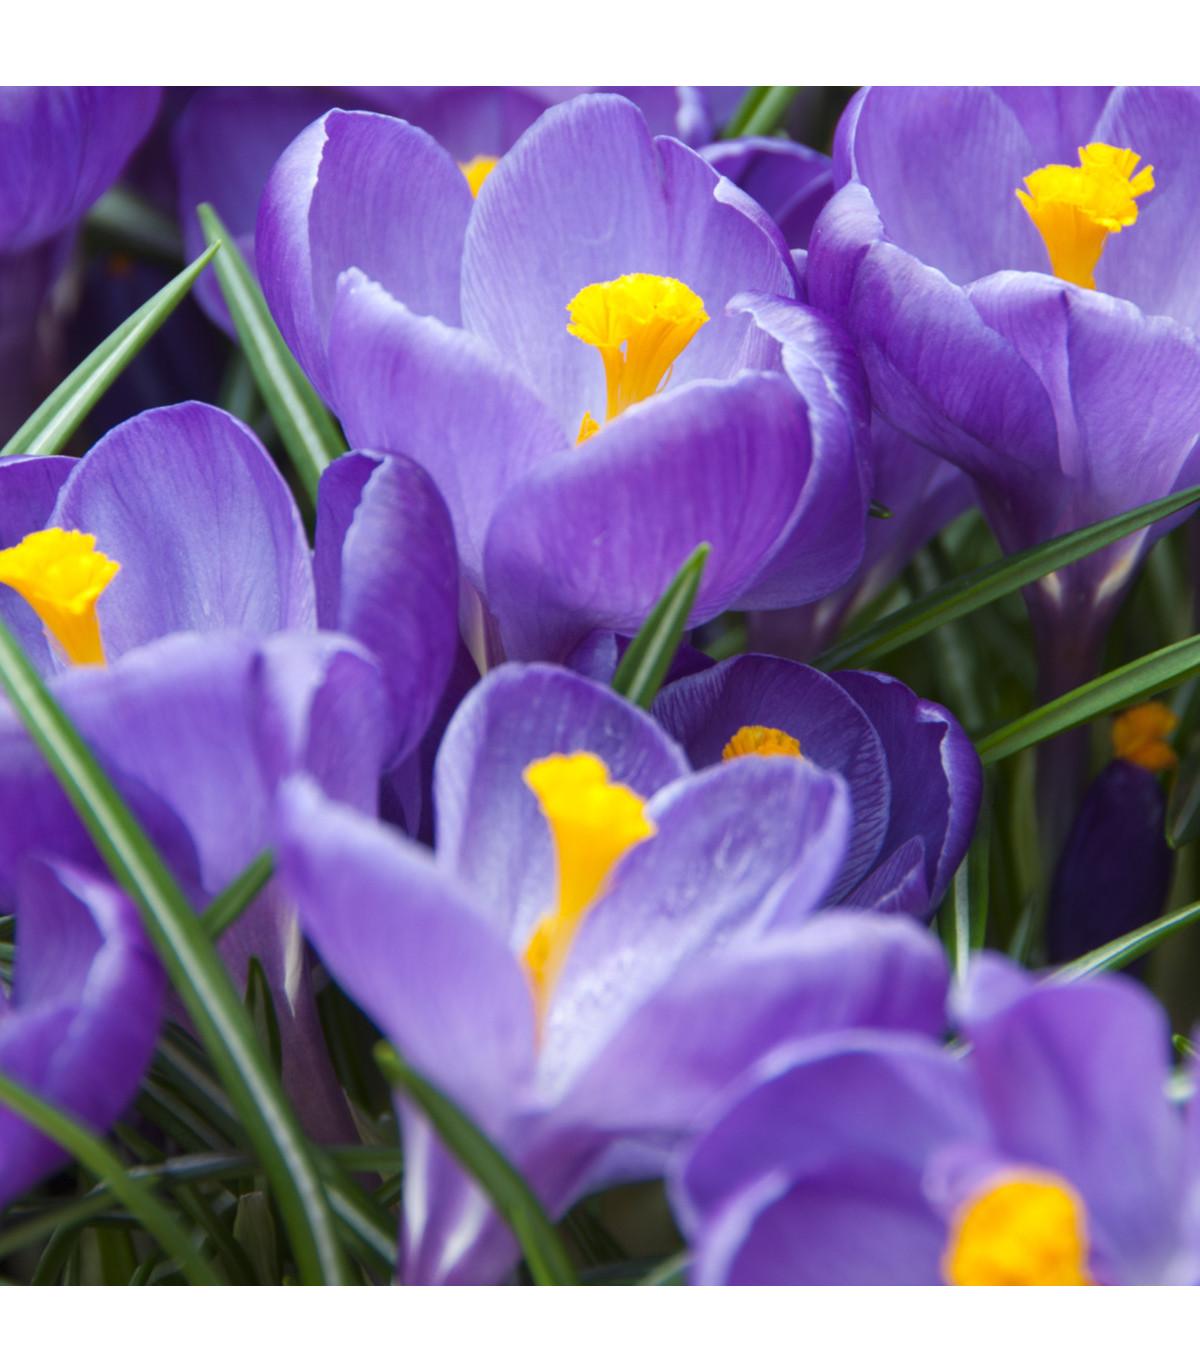 Krokus Flower Record - Crocus Vernus - hlízy krokusů - 3 ks